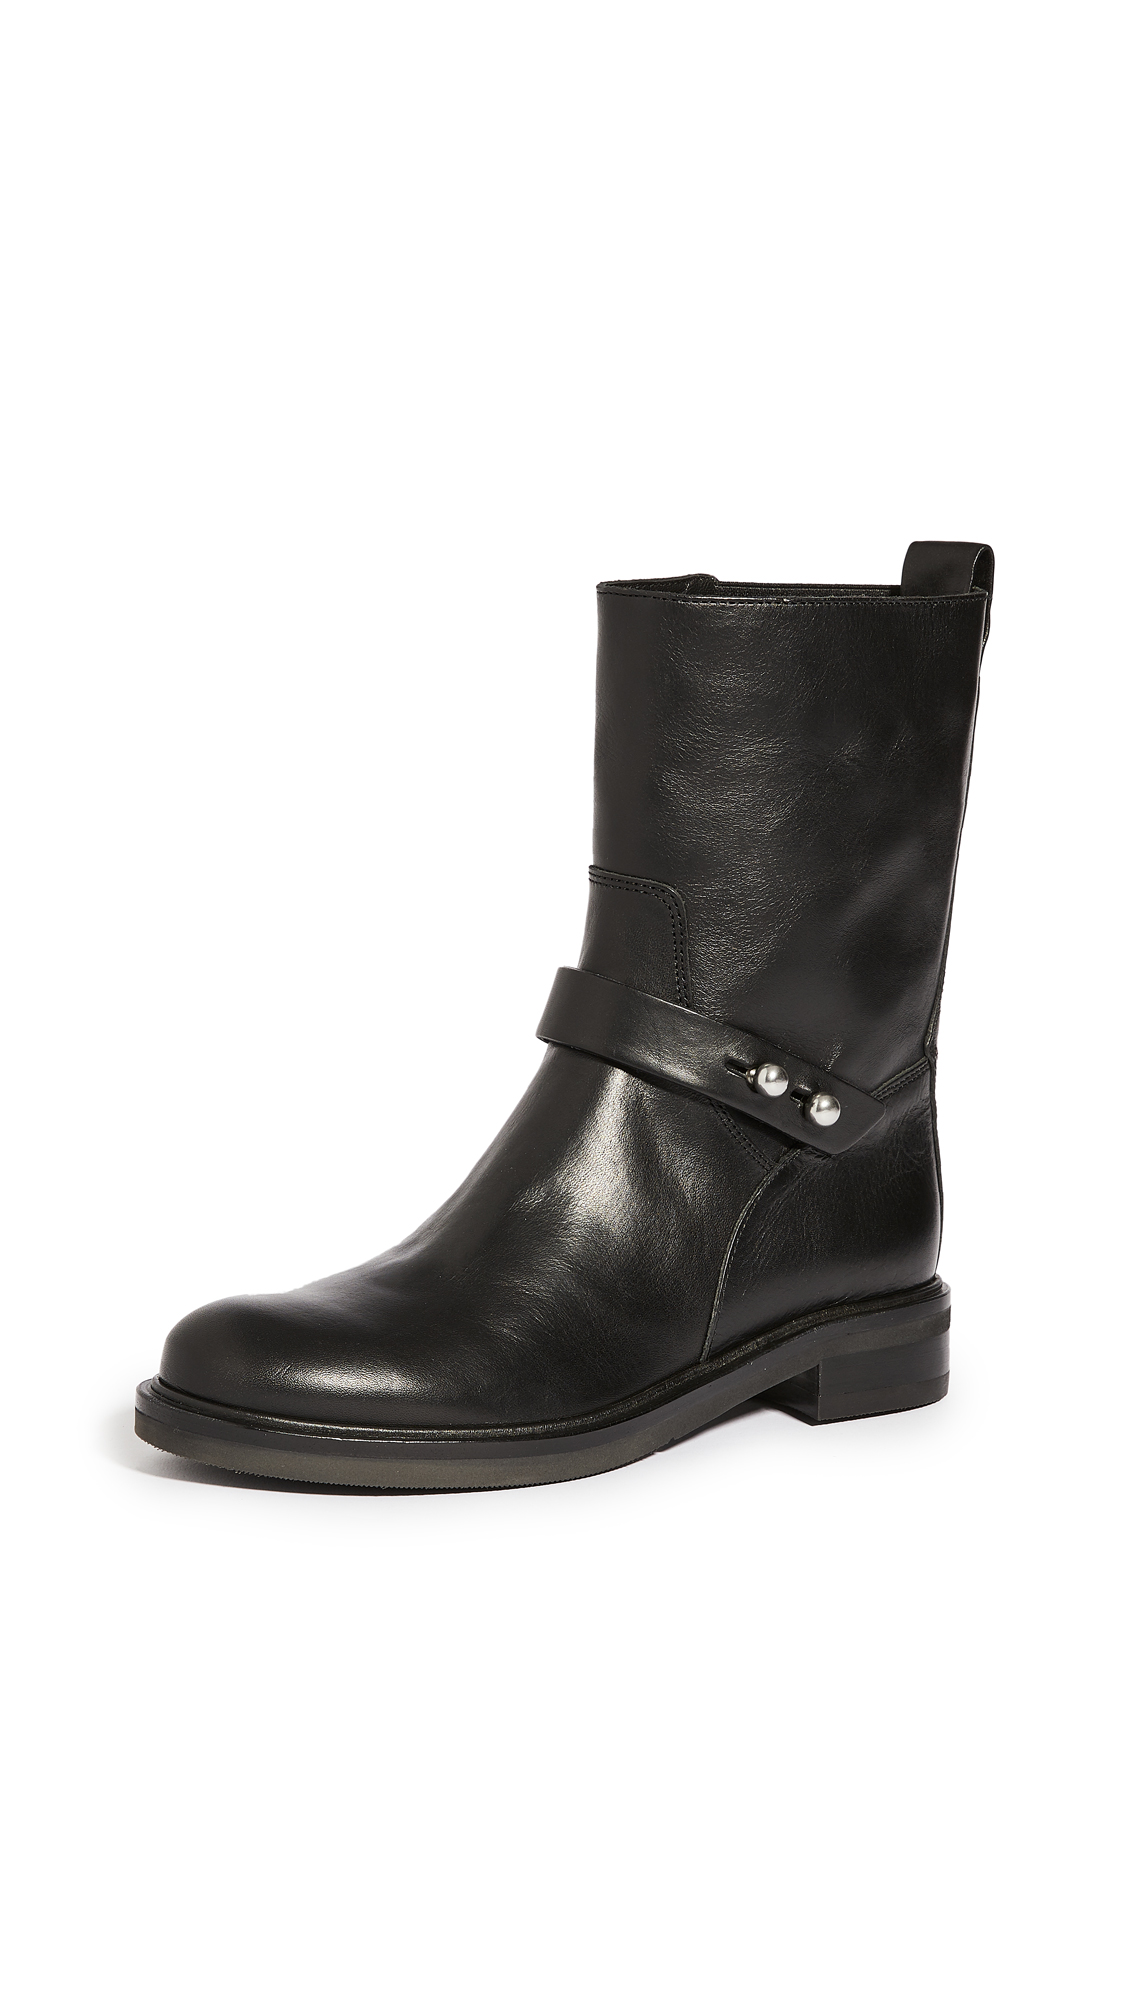 Rag & Bone Slayton Boots